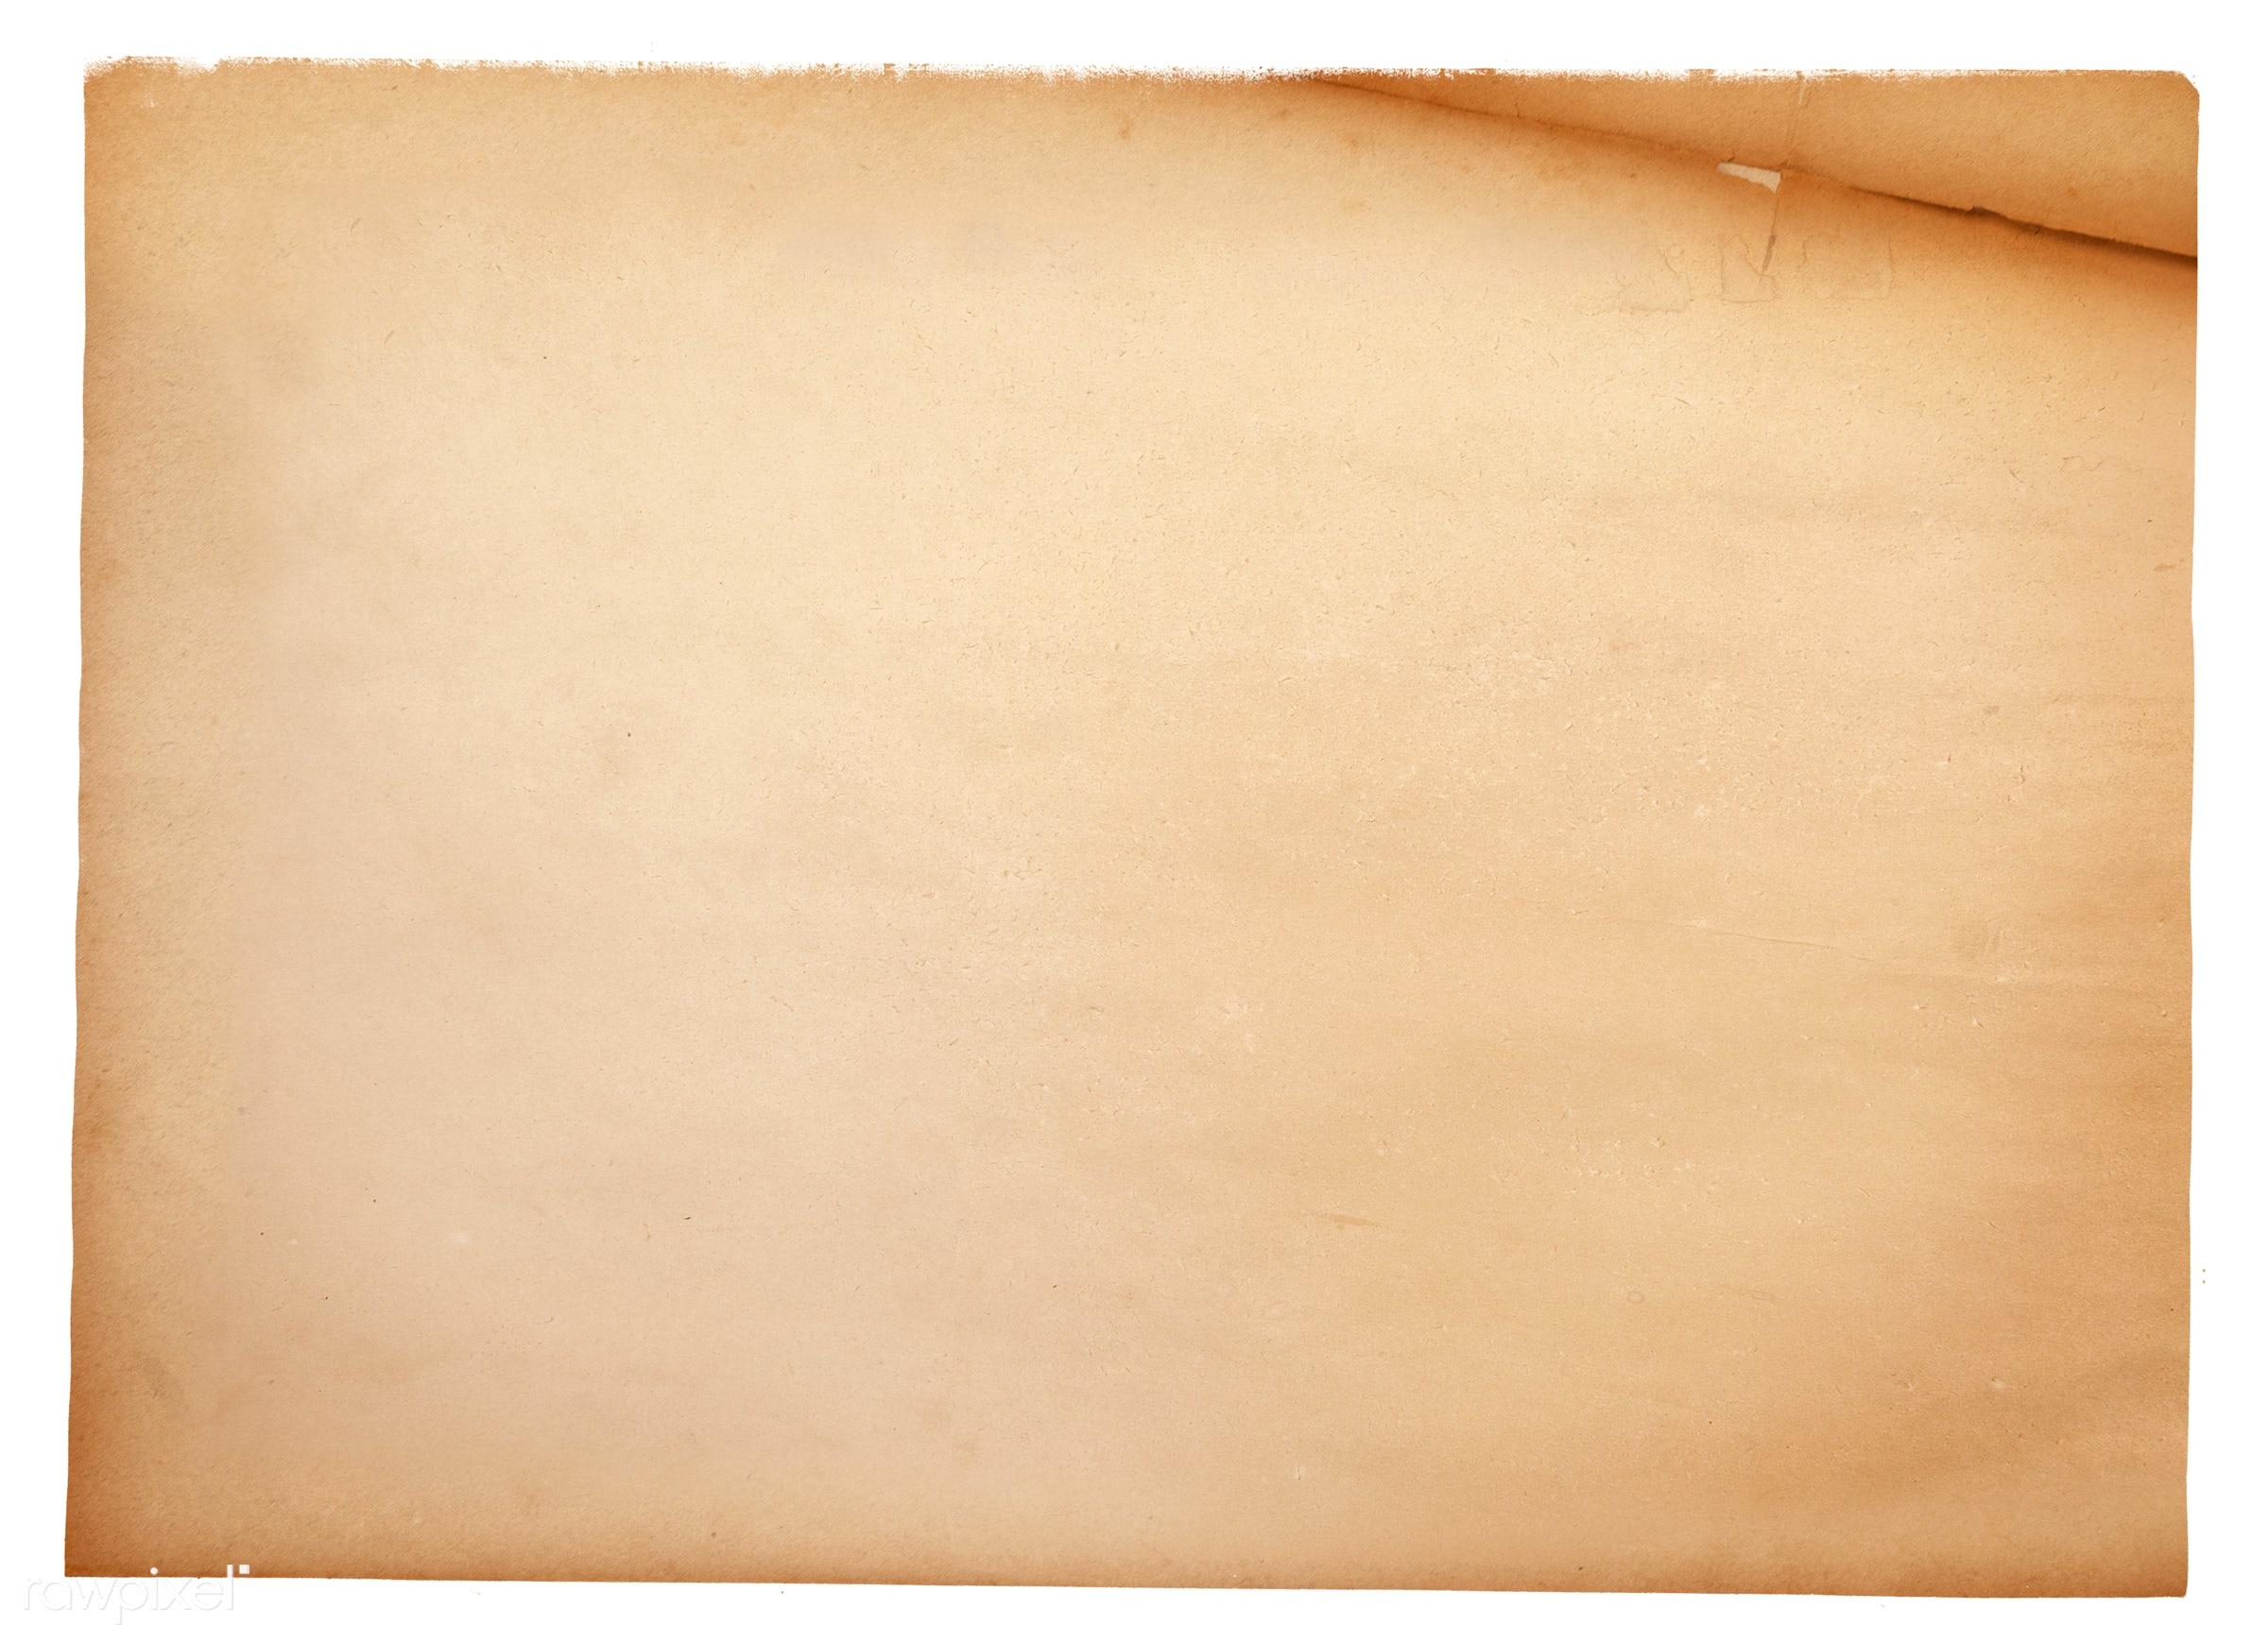 advert, advertise, announcement, banner, blank, board, brown, copy space, cork, corkboard, empty, mock up, mockup,...